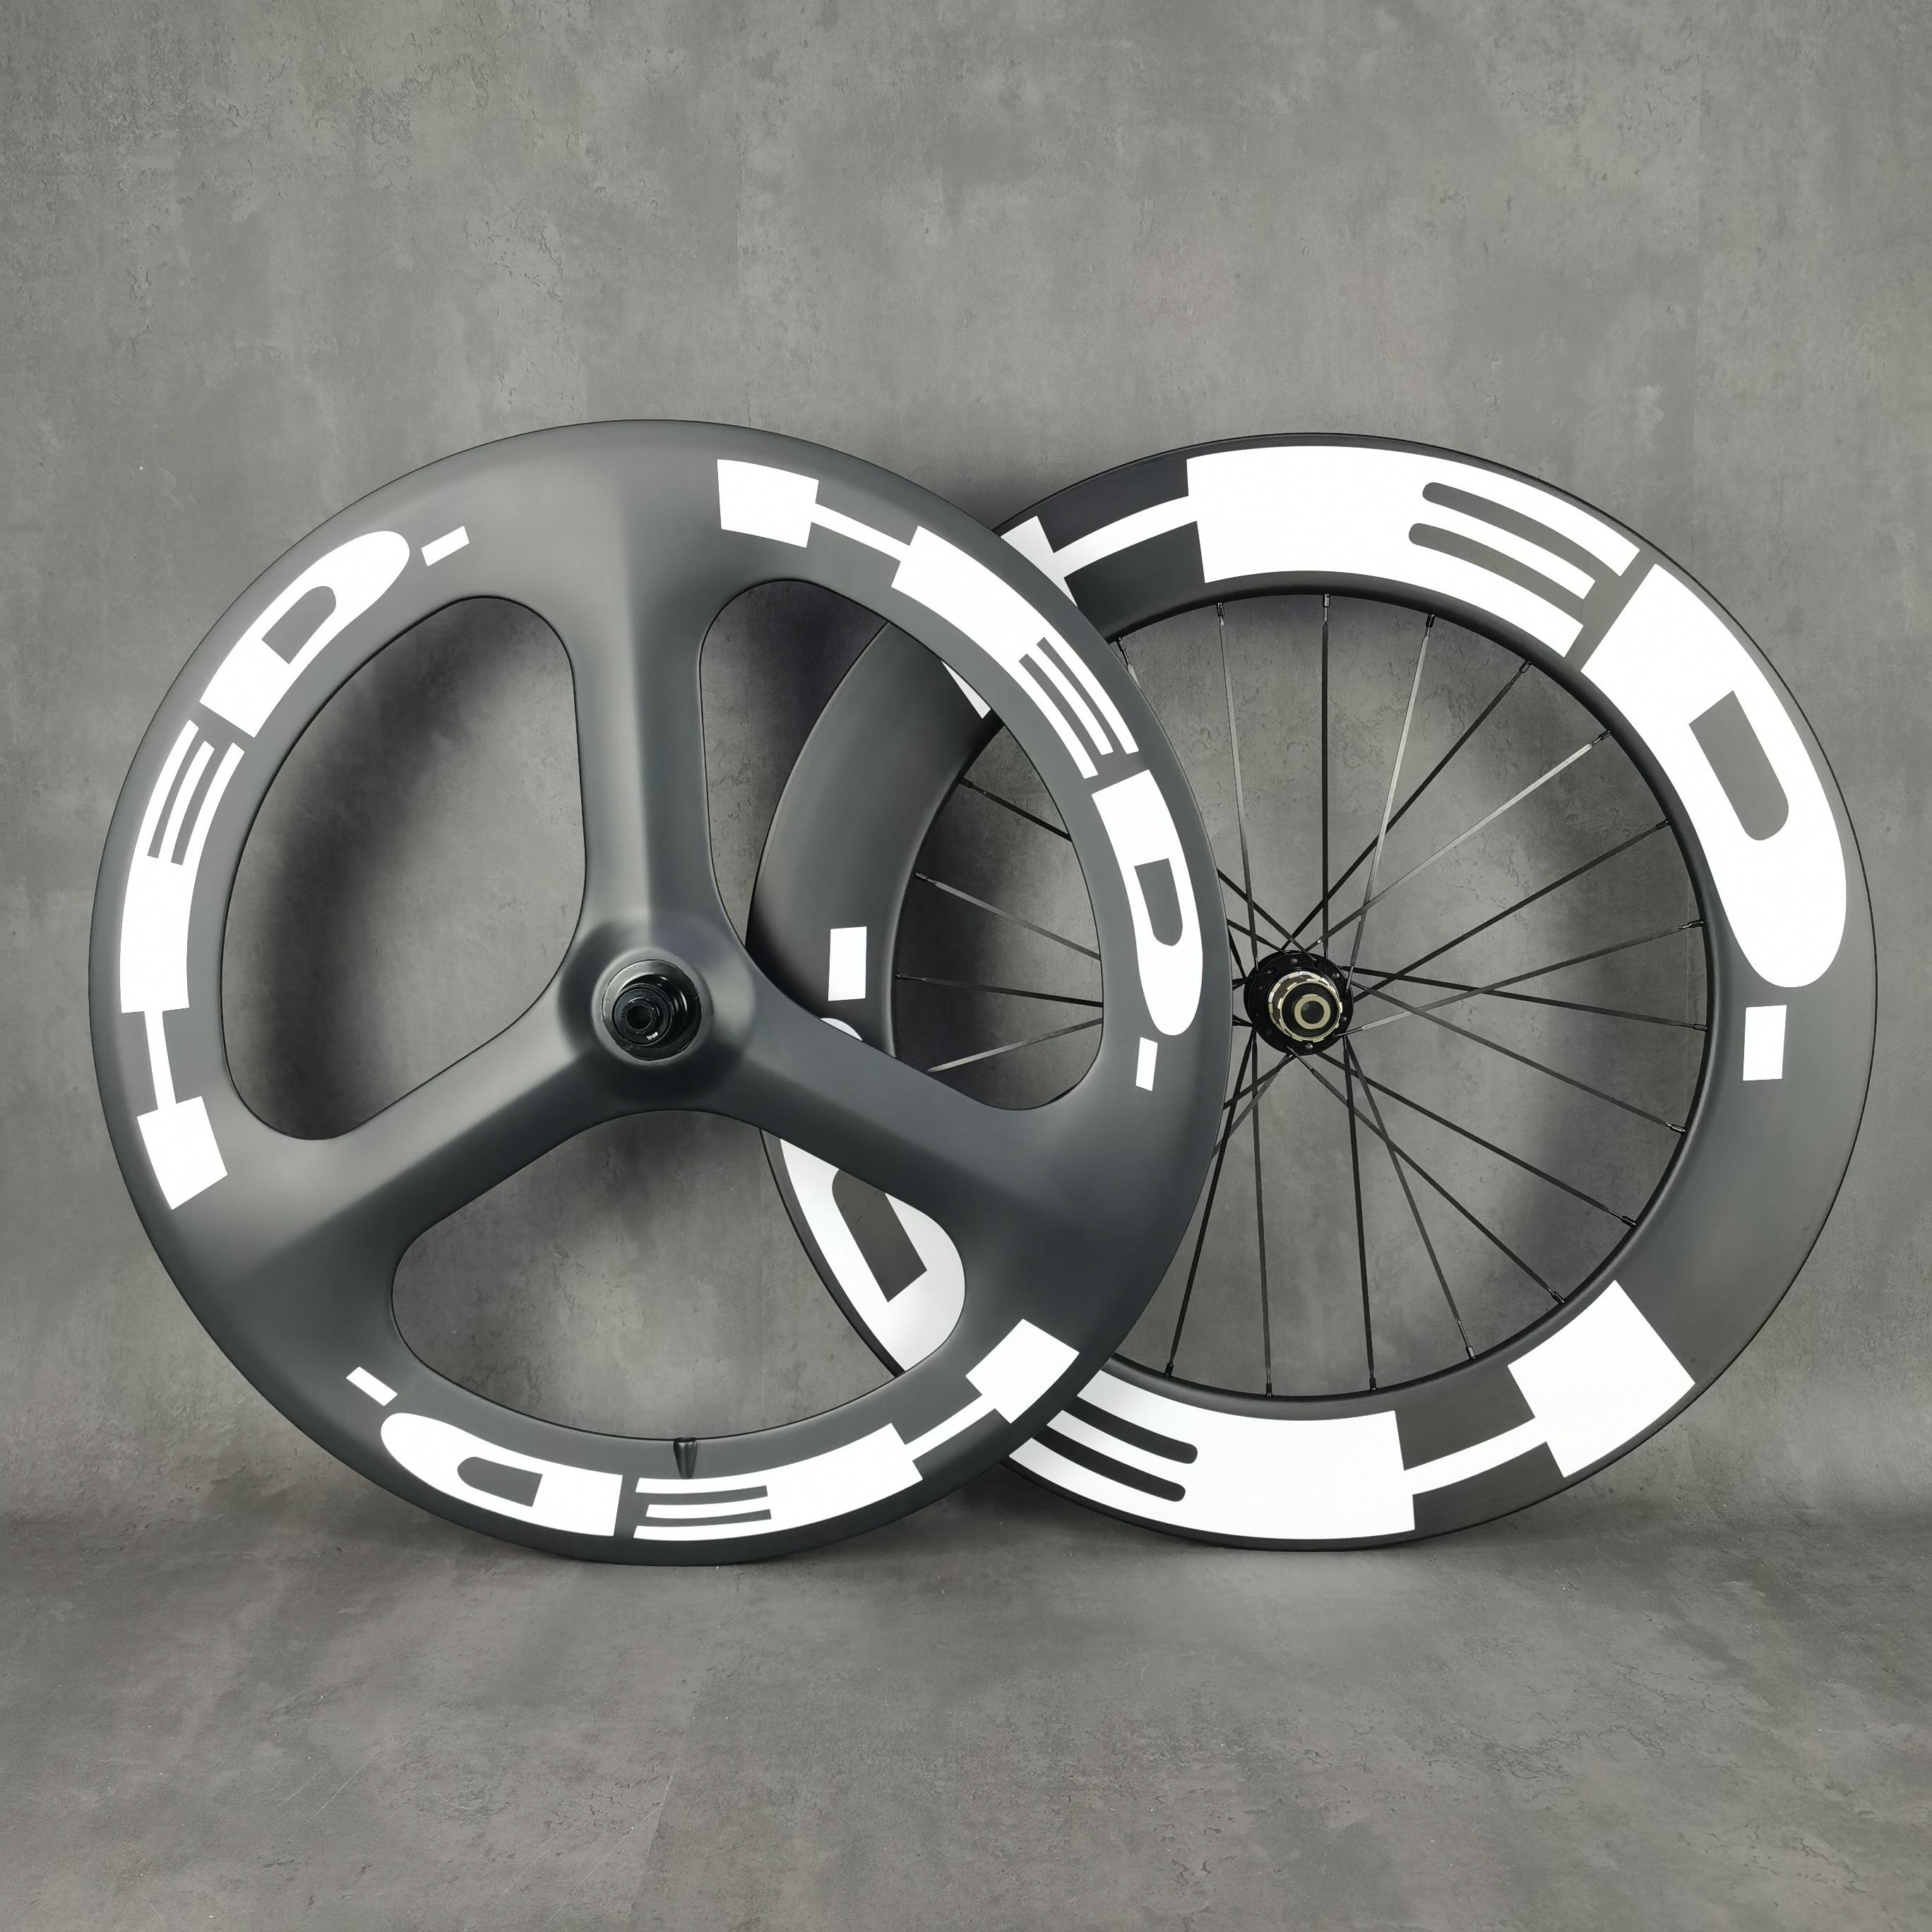 HED 700C Carbon Wheelset Roas 디스크 전면 트라이 스포크 리어 88mm 휠 트랙 / 도로 Wheelset Clincher / Tuabular UD 무광택 마감 Novatec792 허브